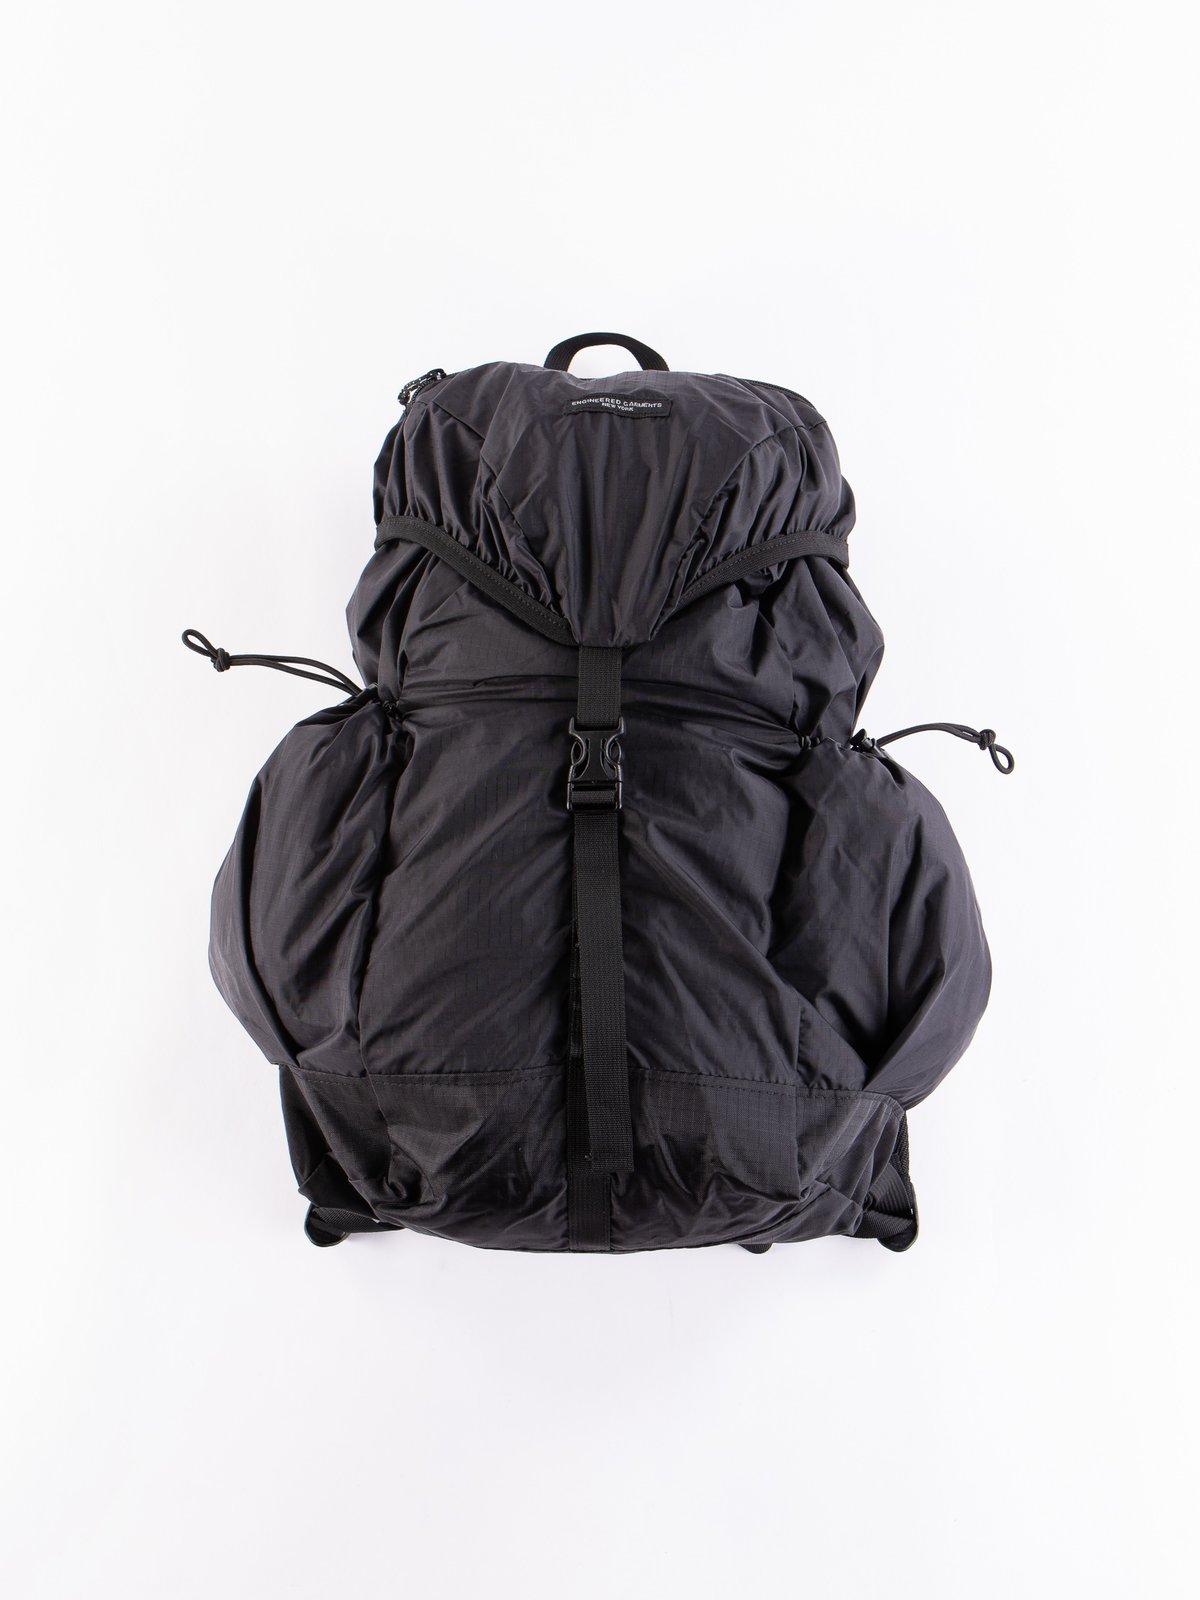 Black Nylon Ripstop UL Backpack - Image 1